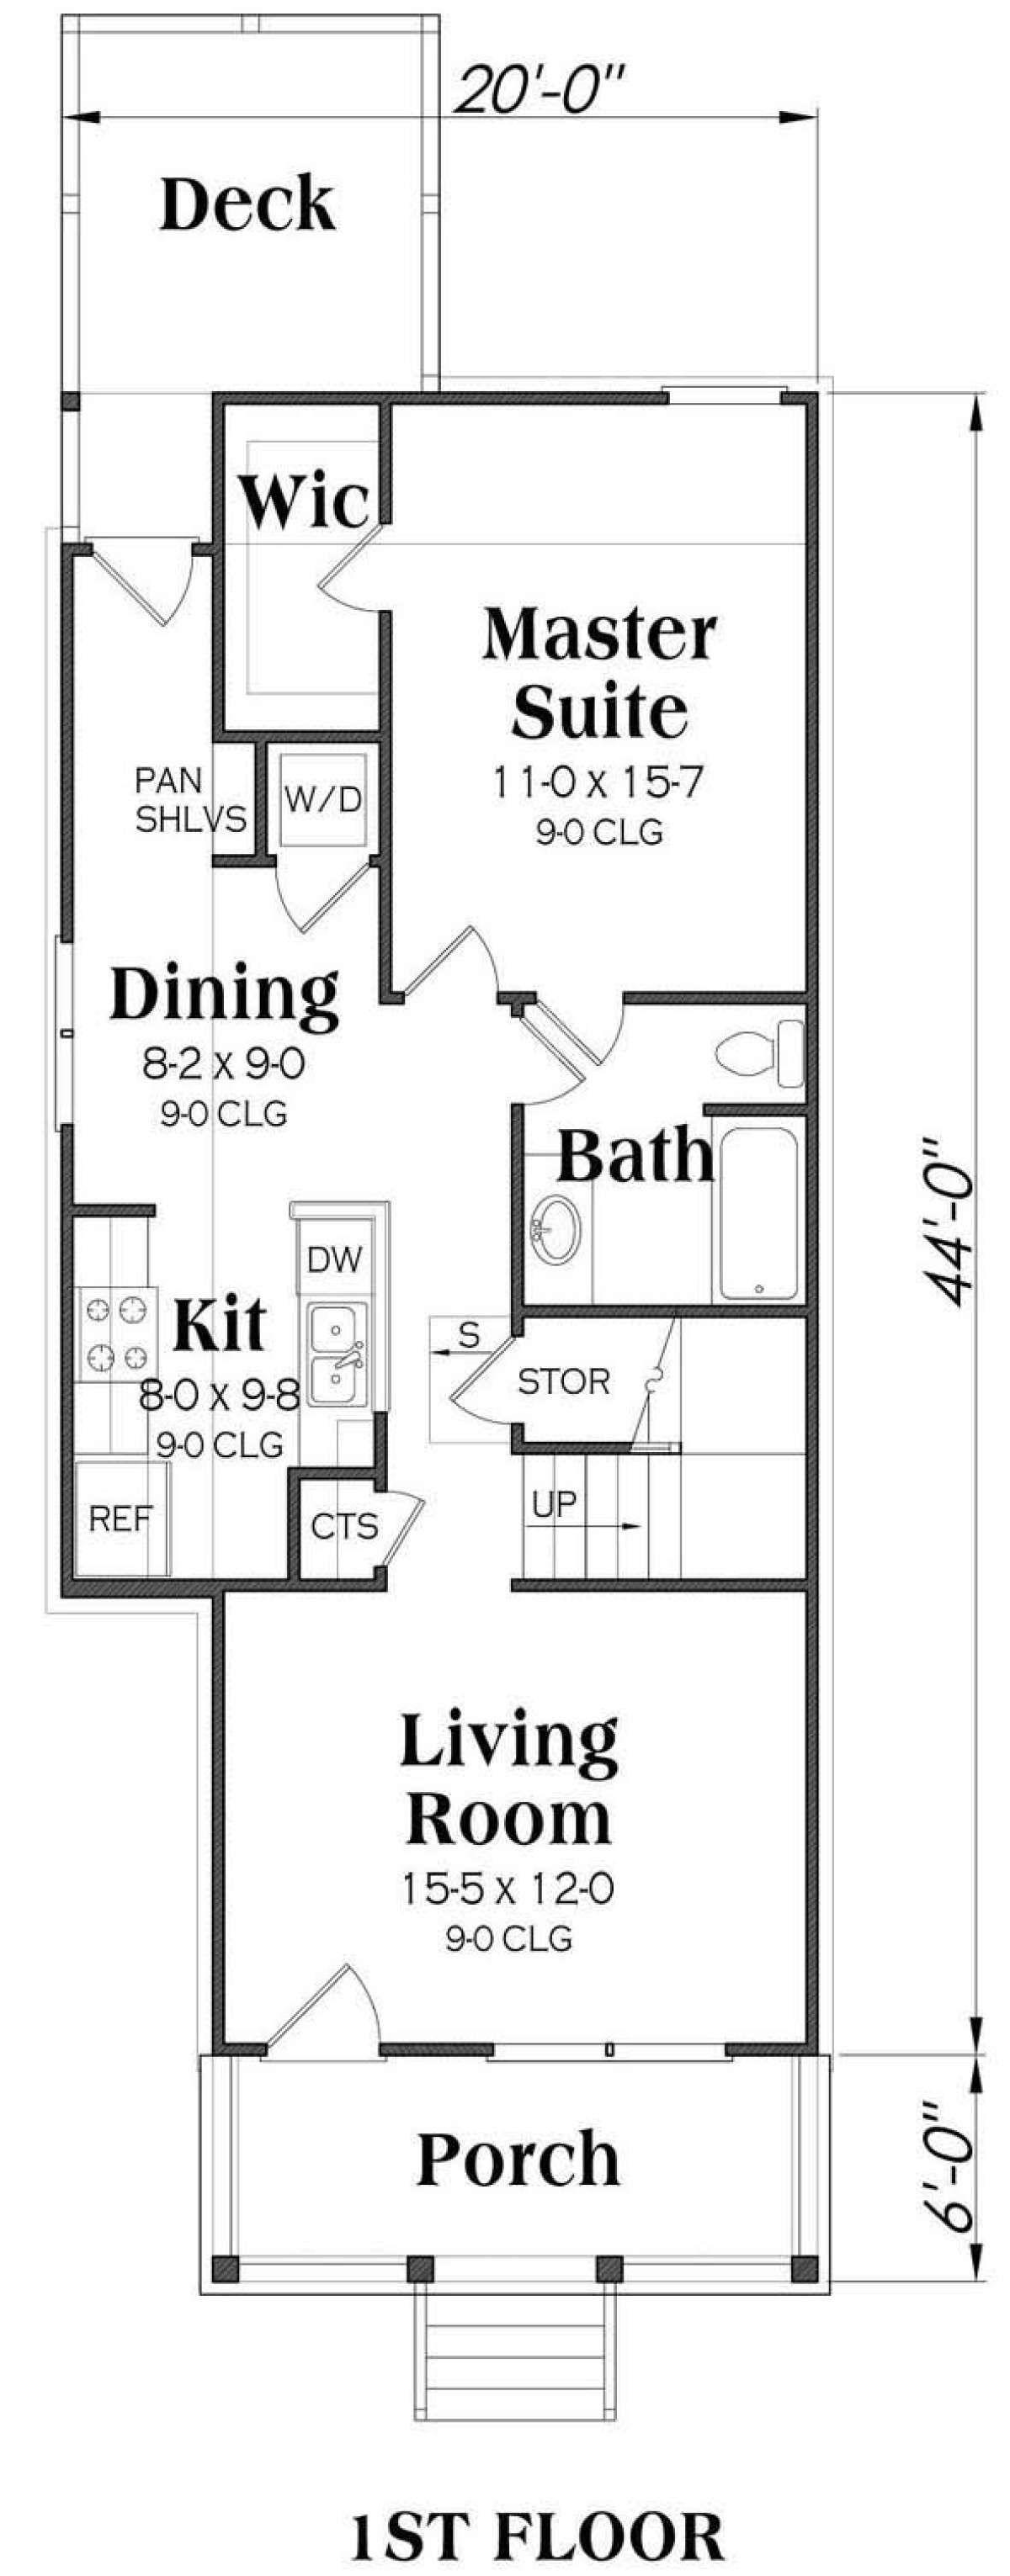 House Plan 00900141 Bungalow Plan 1,400 Square Feet, 3